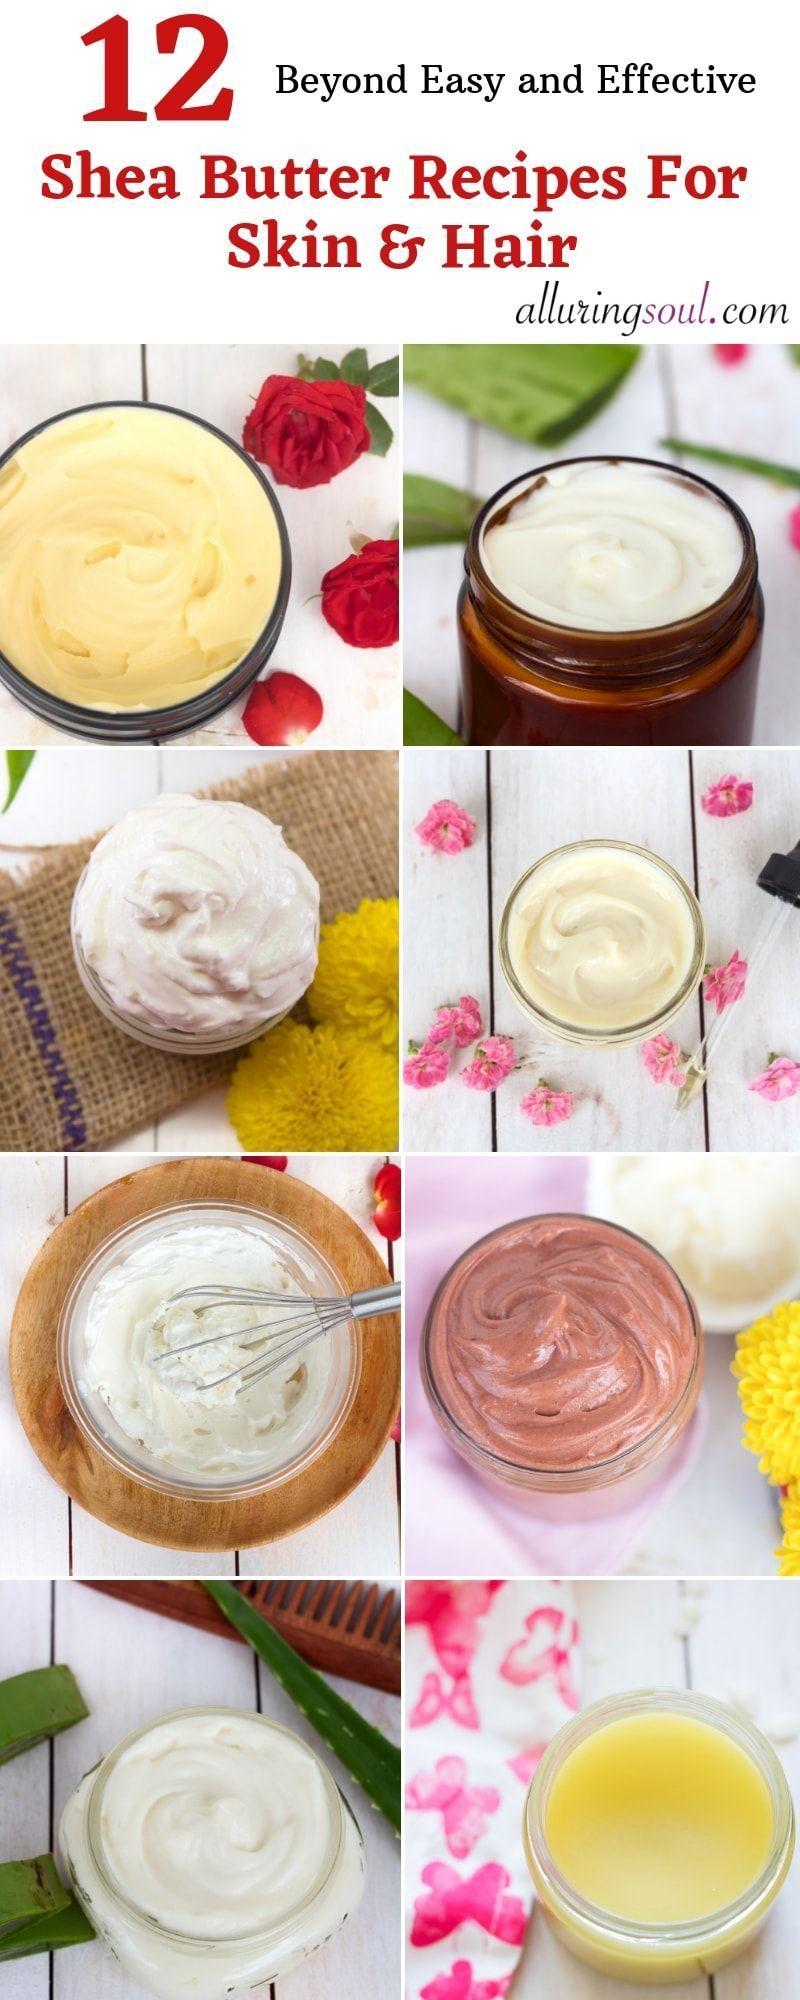 how to make shea butter creamy